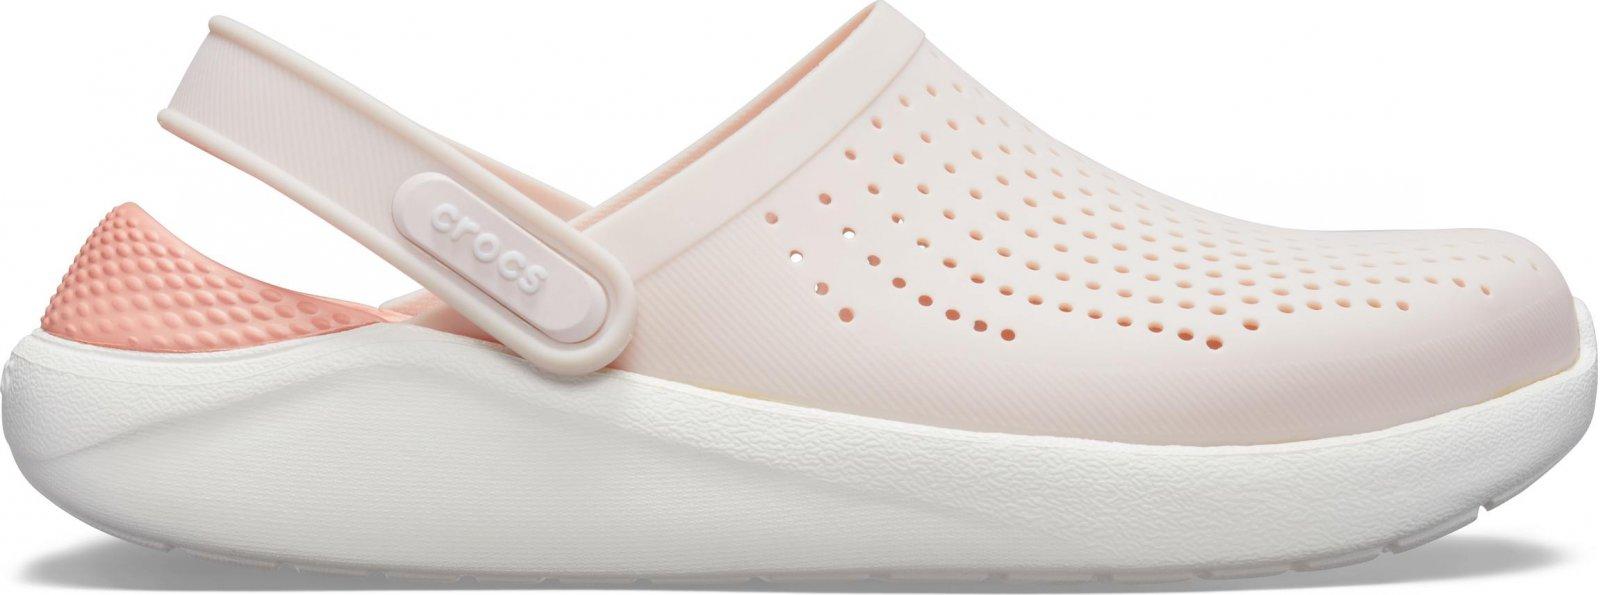 a8f4ac154 Crocs Literide Clog růžové bílé 36-37 - Srovnejte ceny!